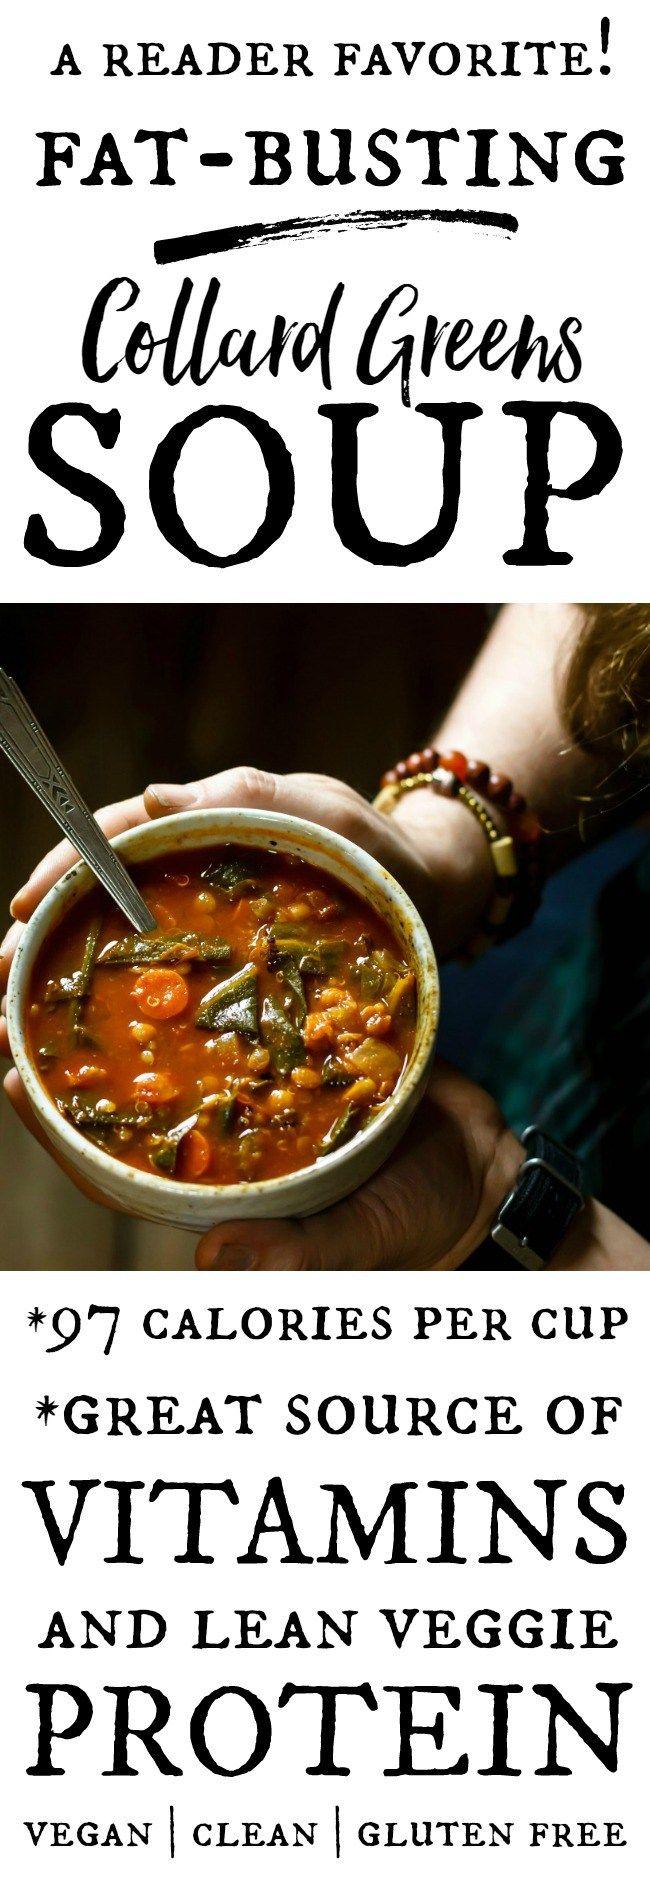 Fat-Busting Vegetarian Collard Greens Soup #favoriterecipes